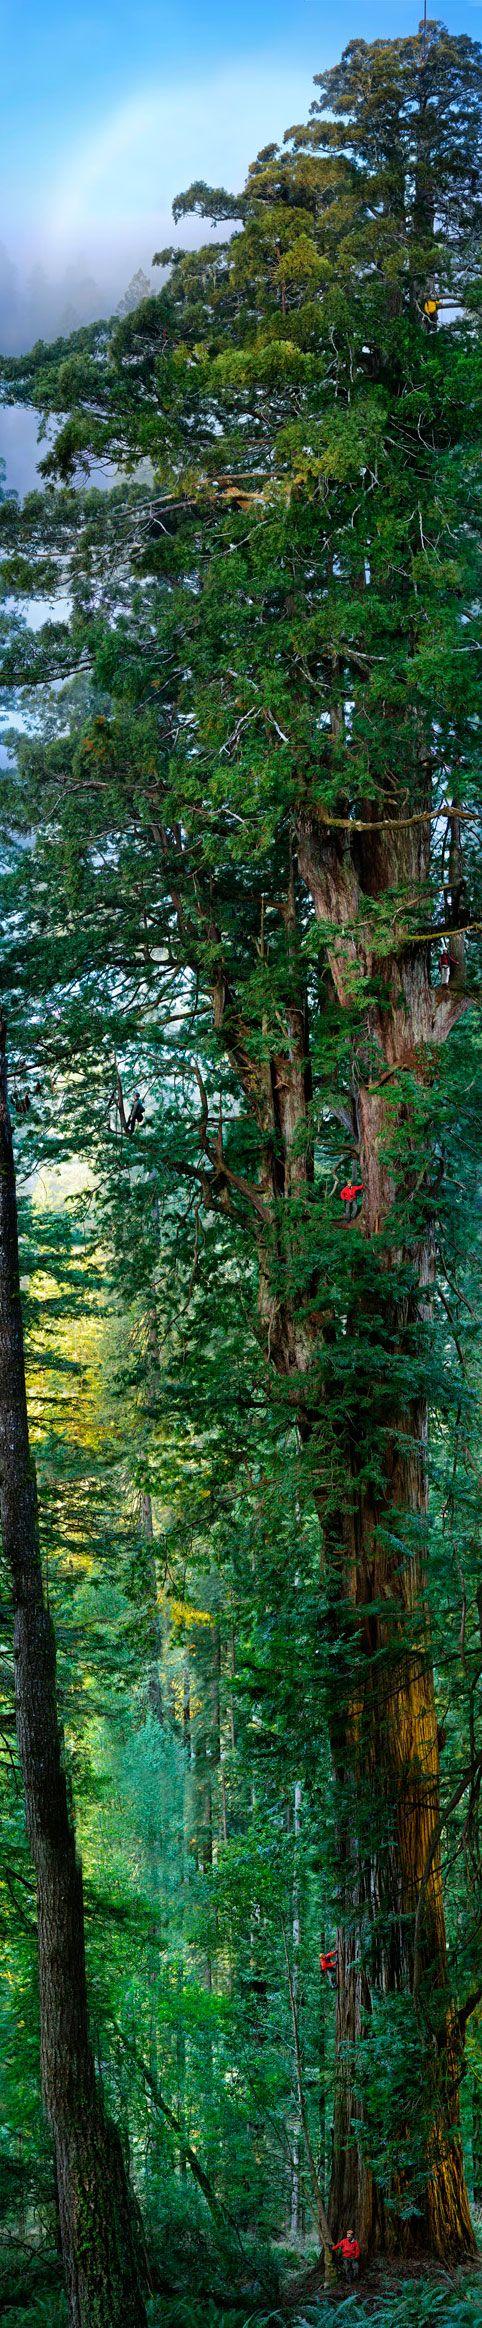 Sequoia National Park, California, United States.